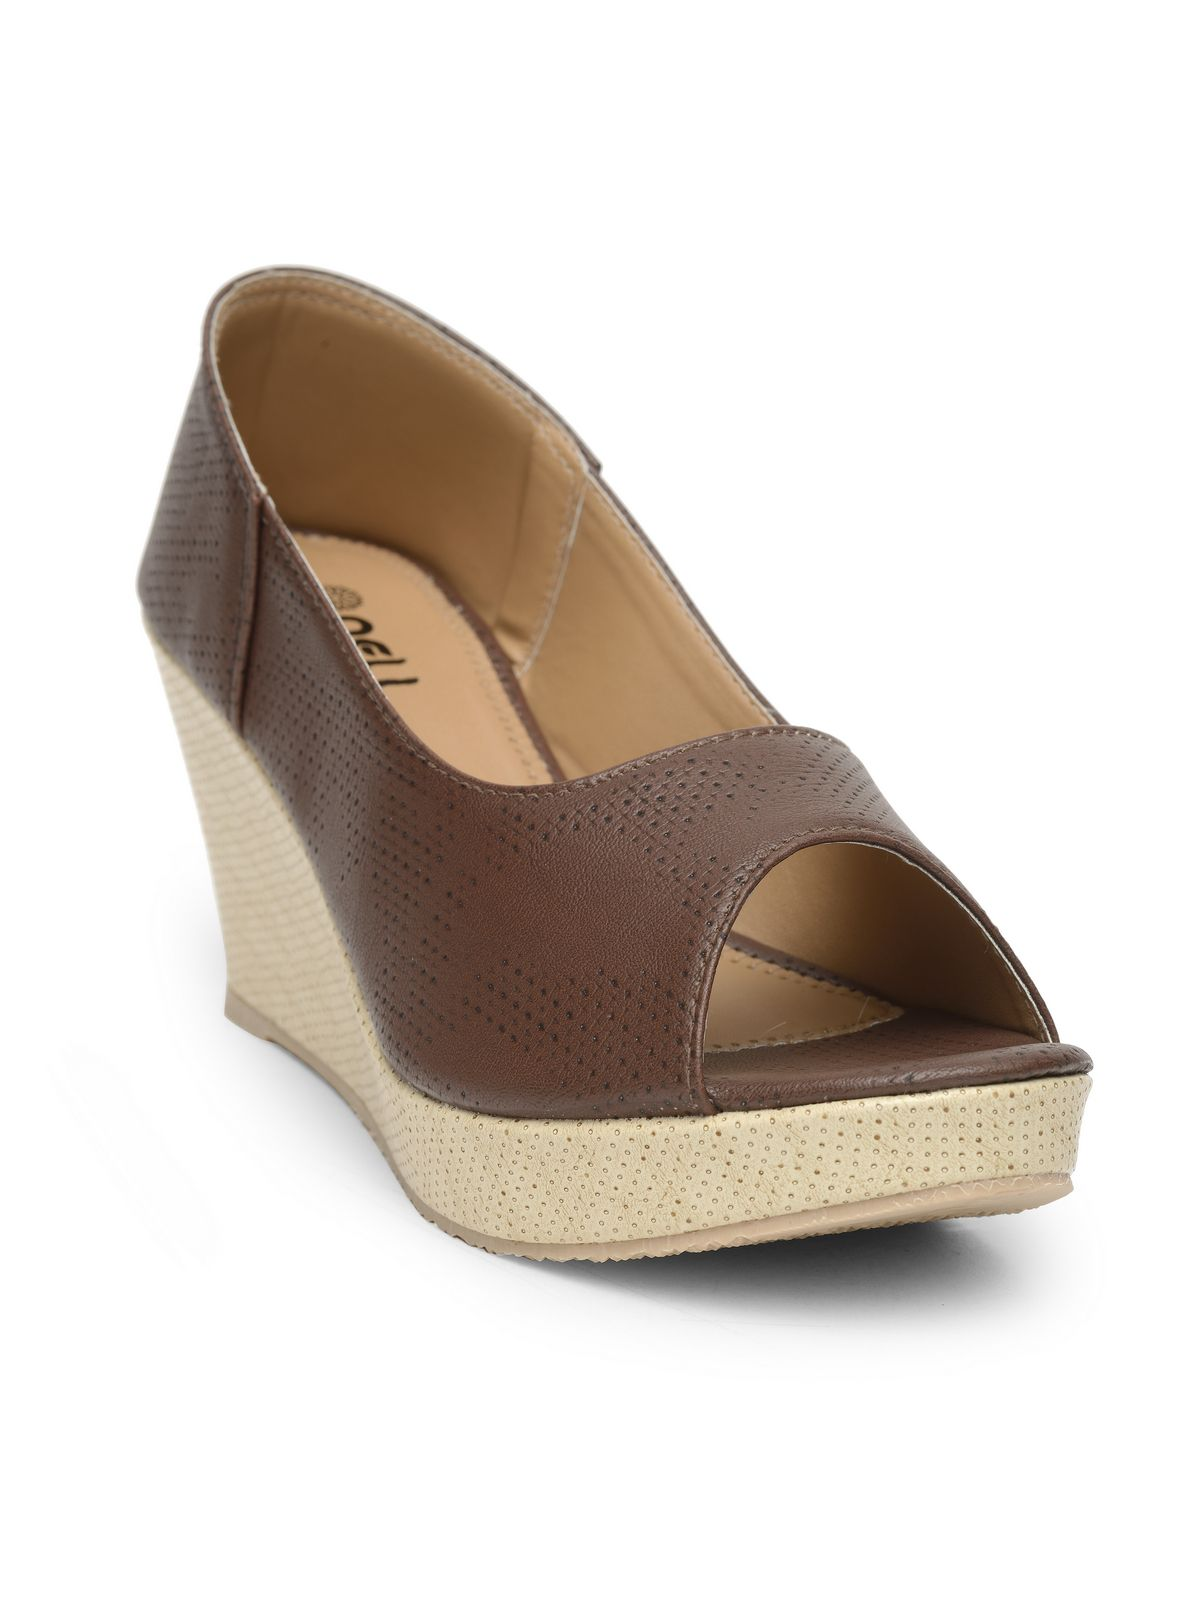 NELL Brown Wedges Heels